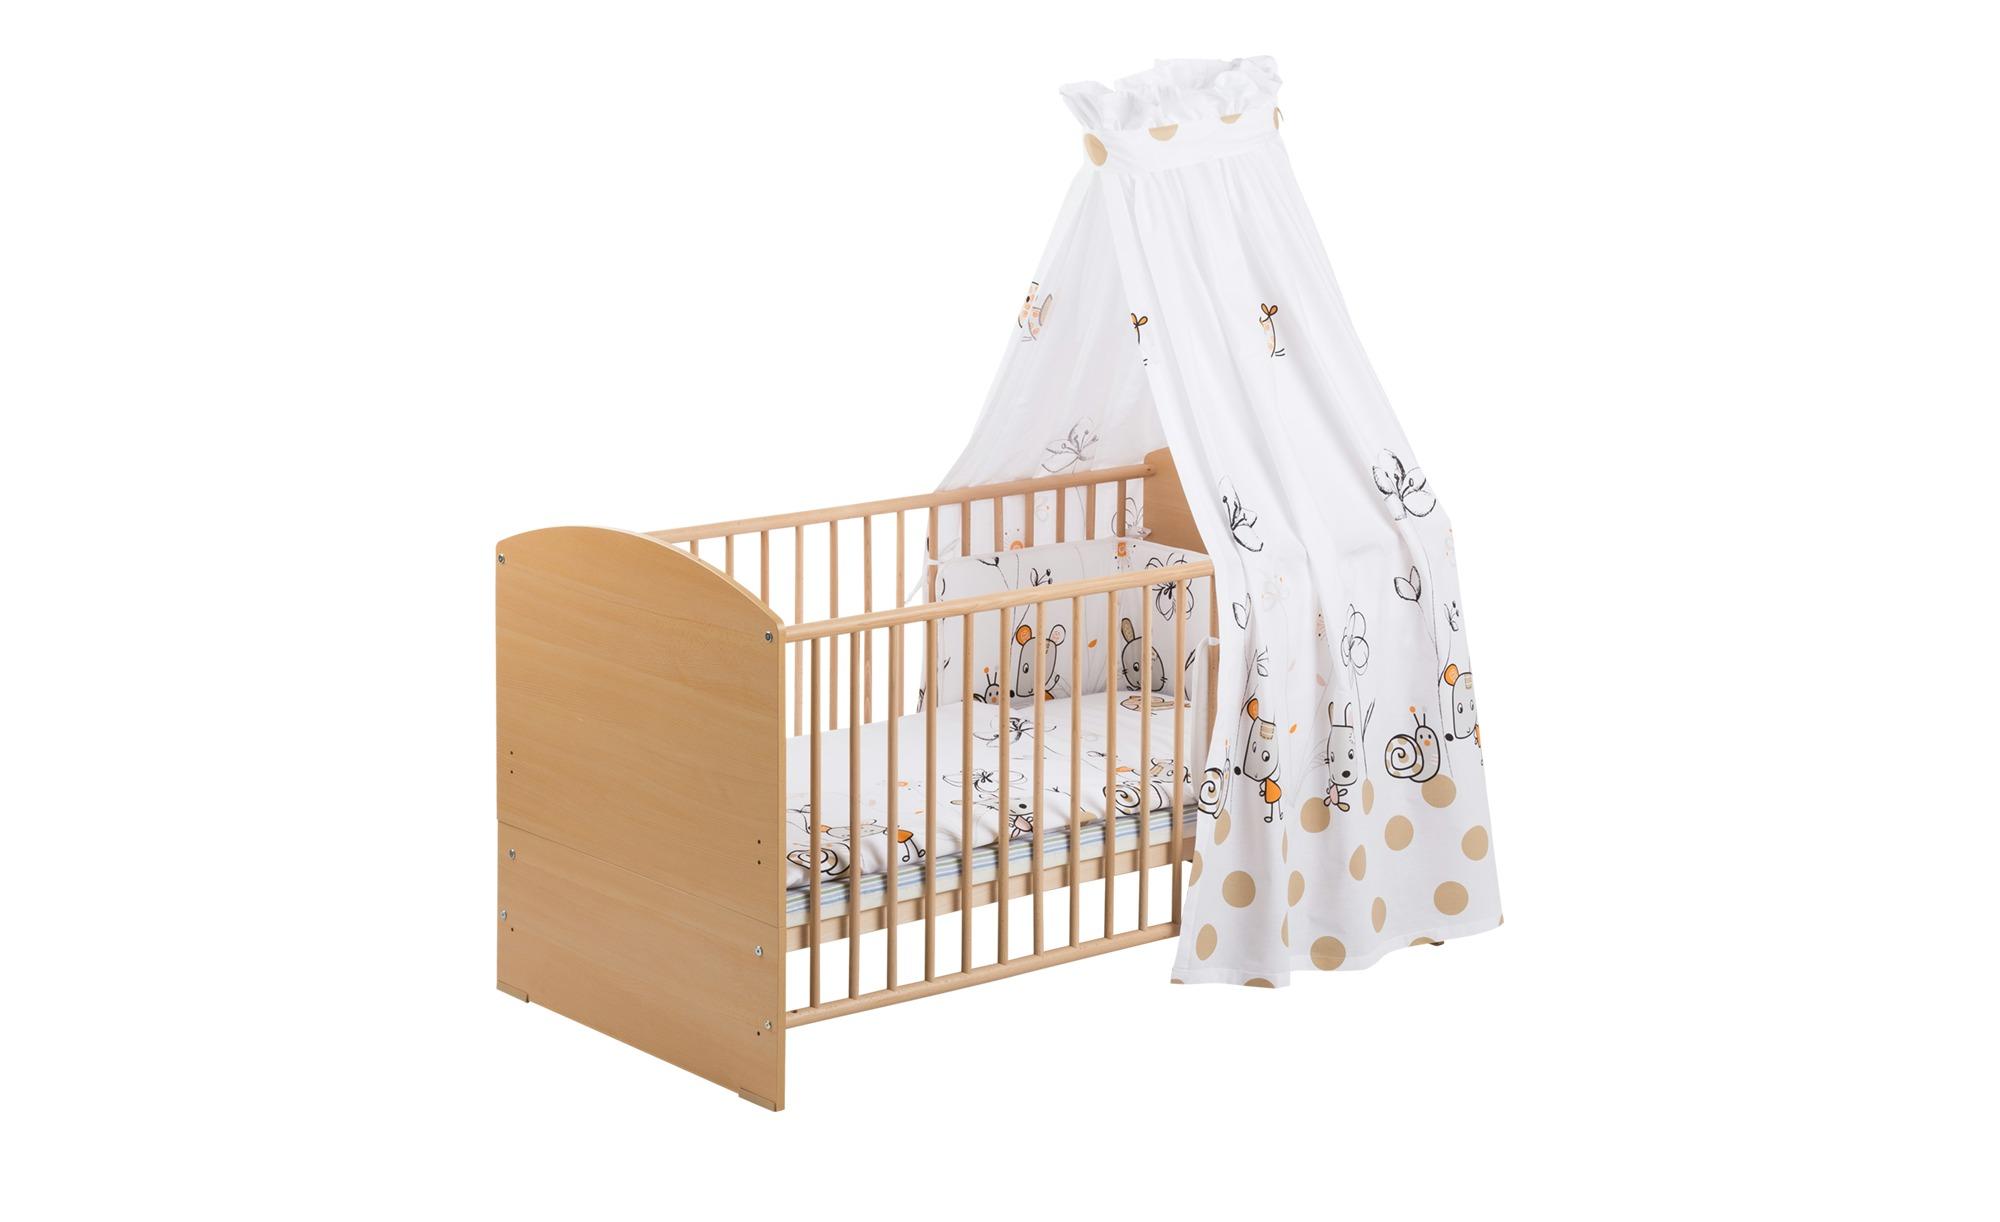 Kinderbett-Komplettset 'Frühling'